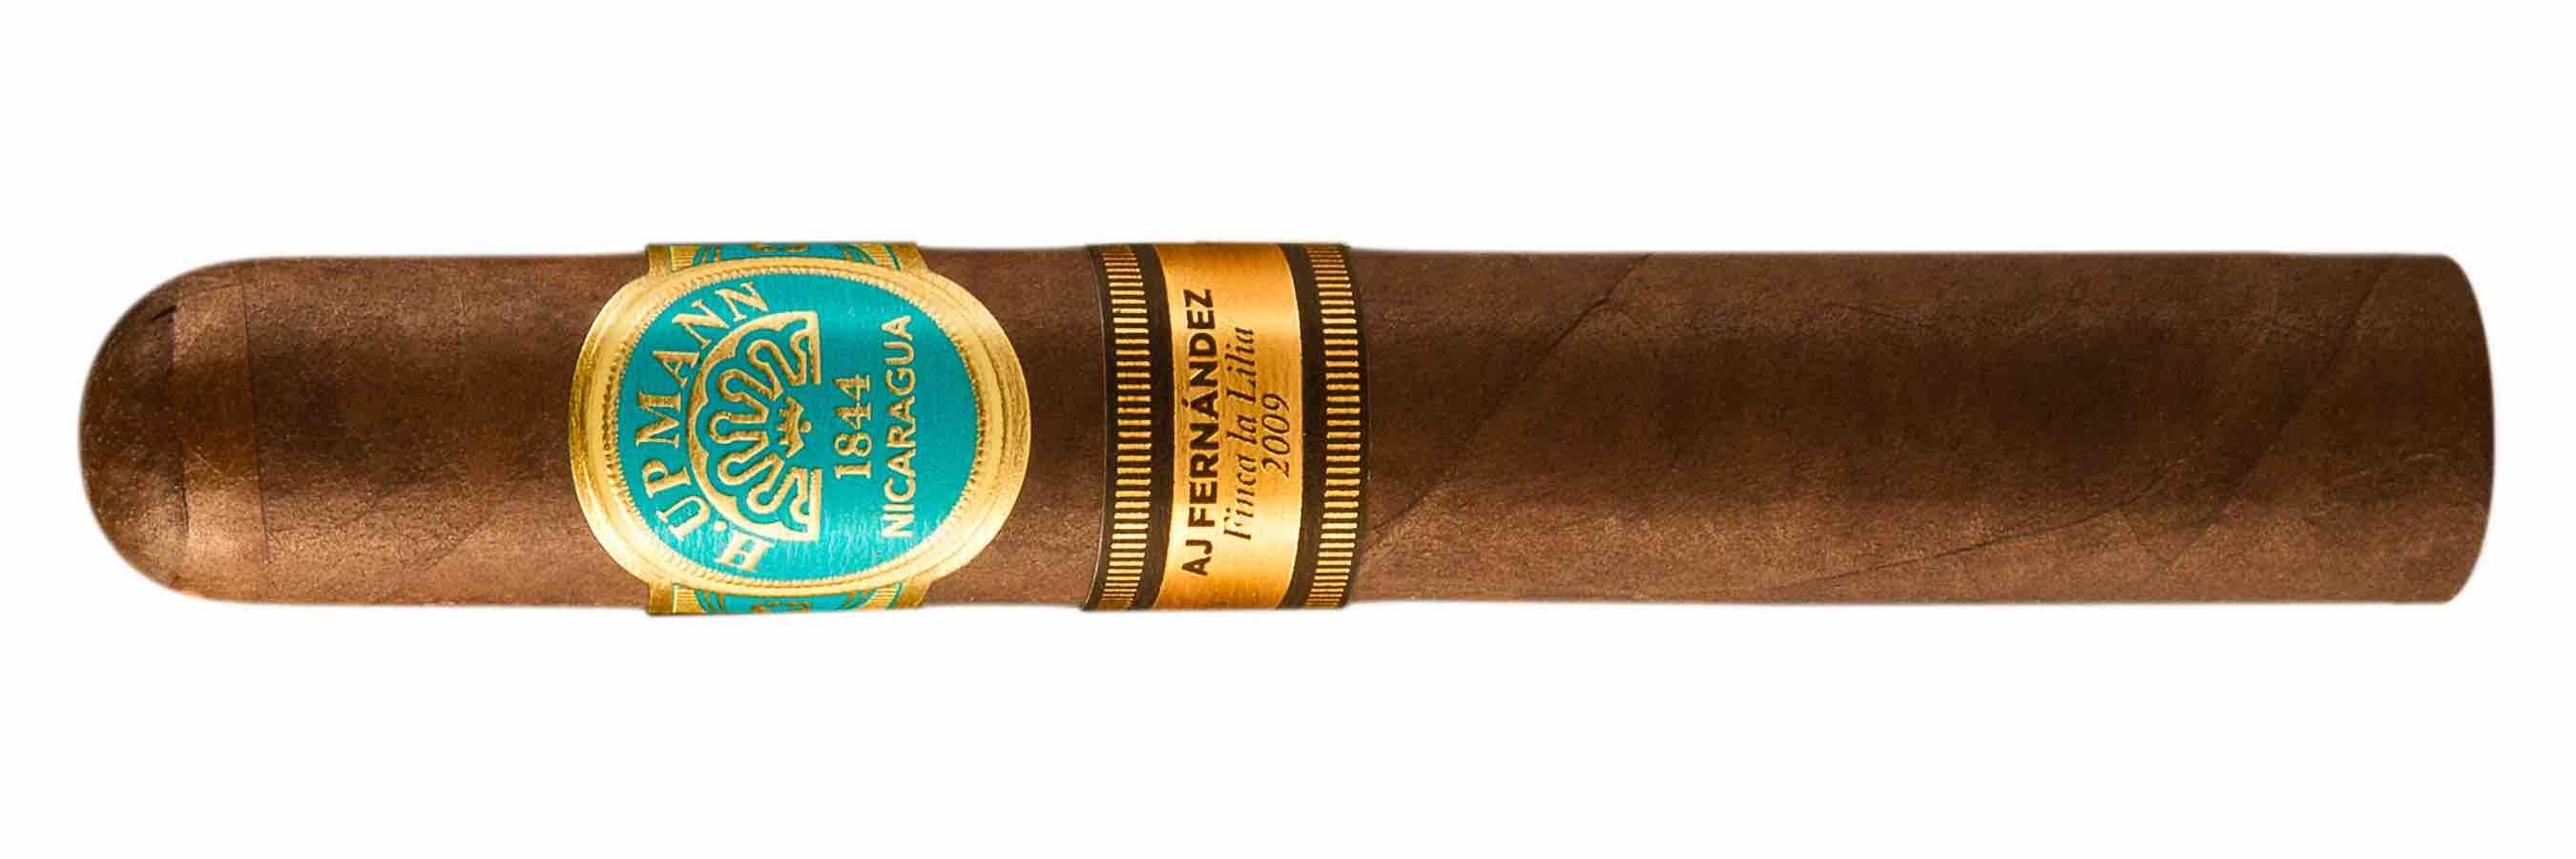 Cigar News: H. Upmann Nicaragua by AJ Fernandez Adds Finca La Lilia 2009